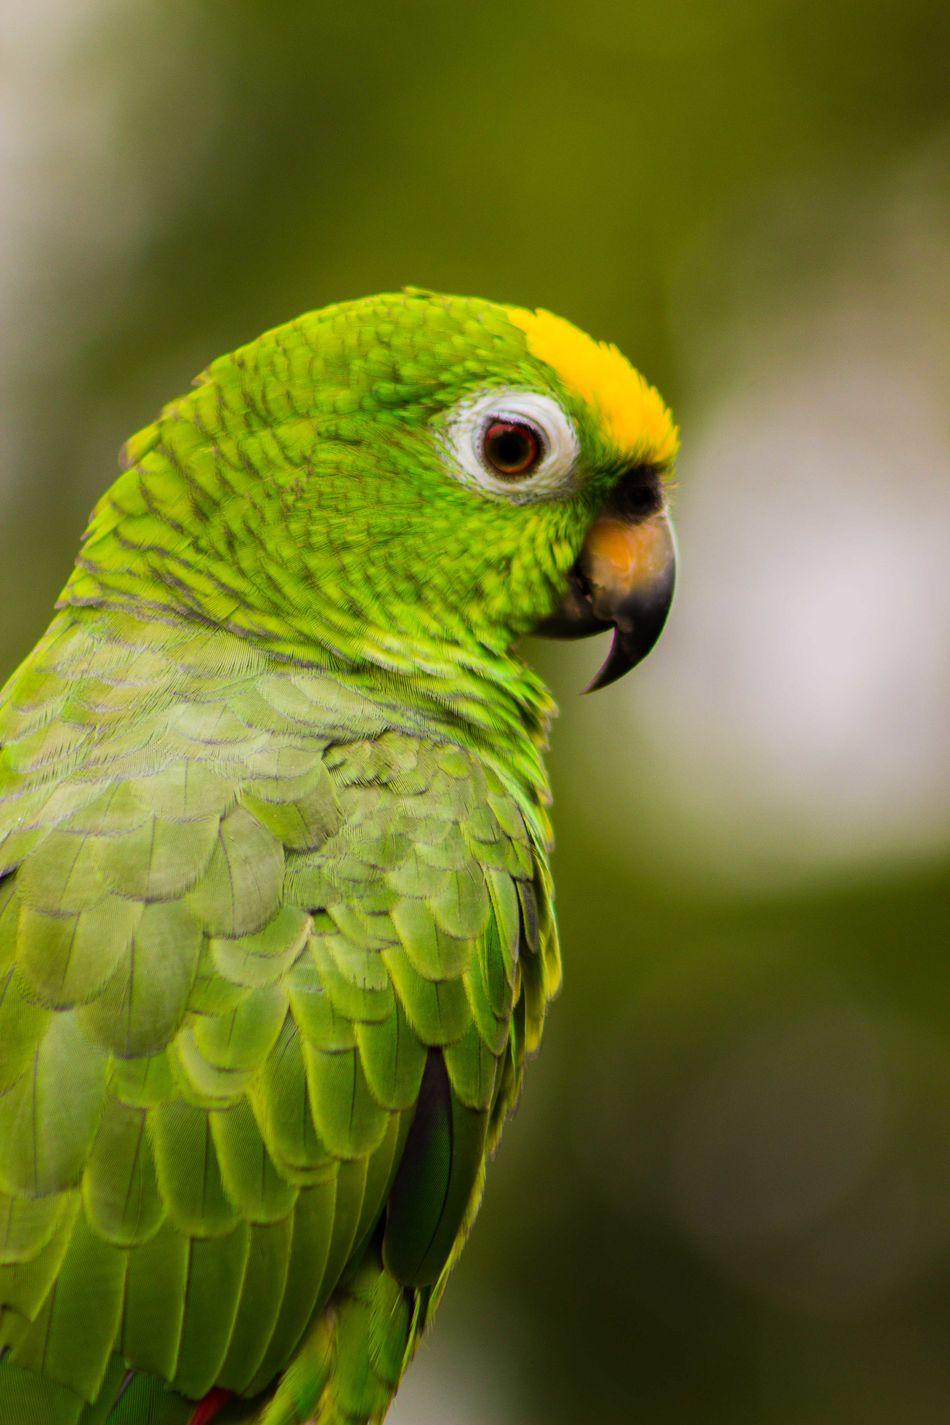 #bird #birds #Nature  Animal Themes Animal Wildlife Close-up Green Color One Animal Parrot First Eyeem Photo